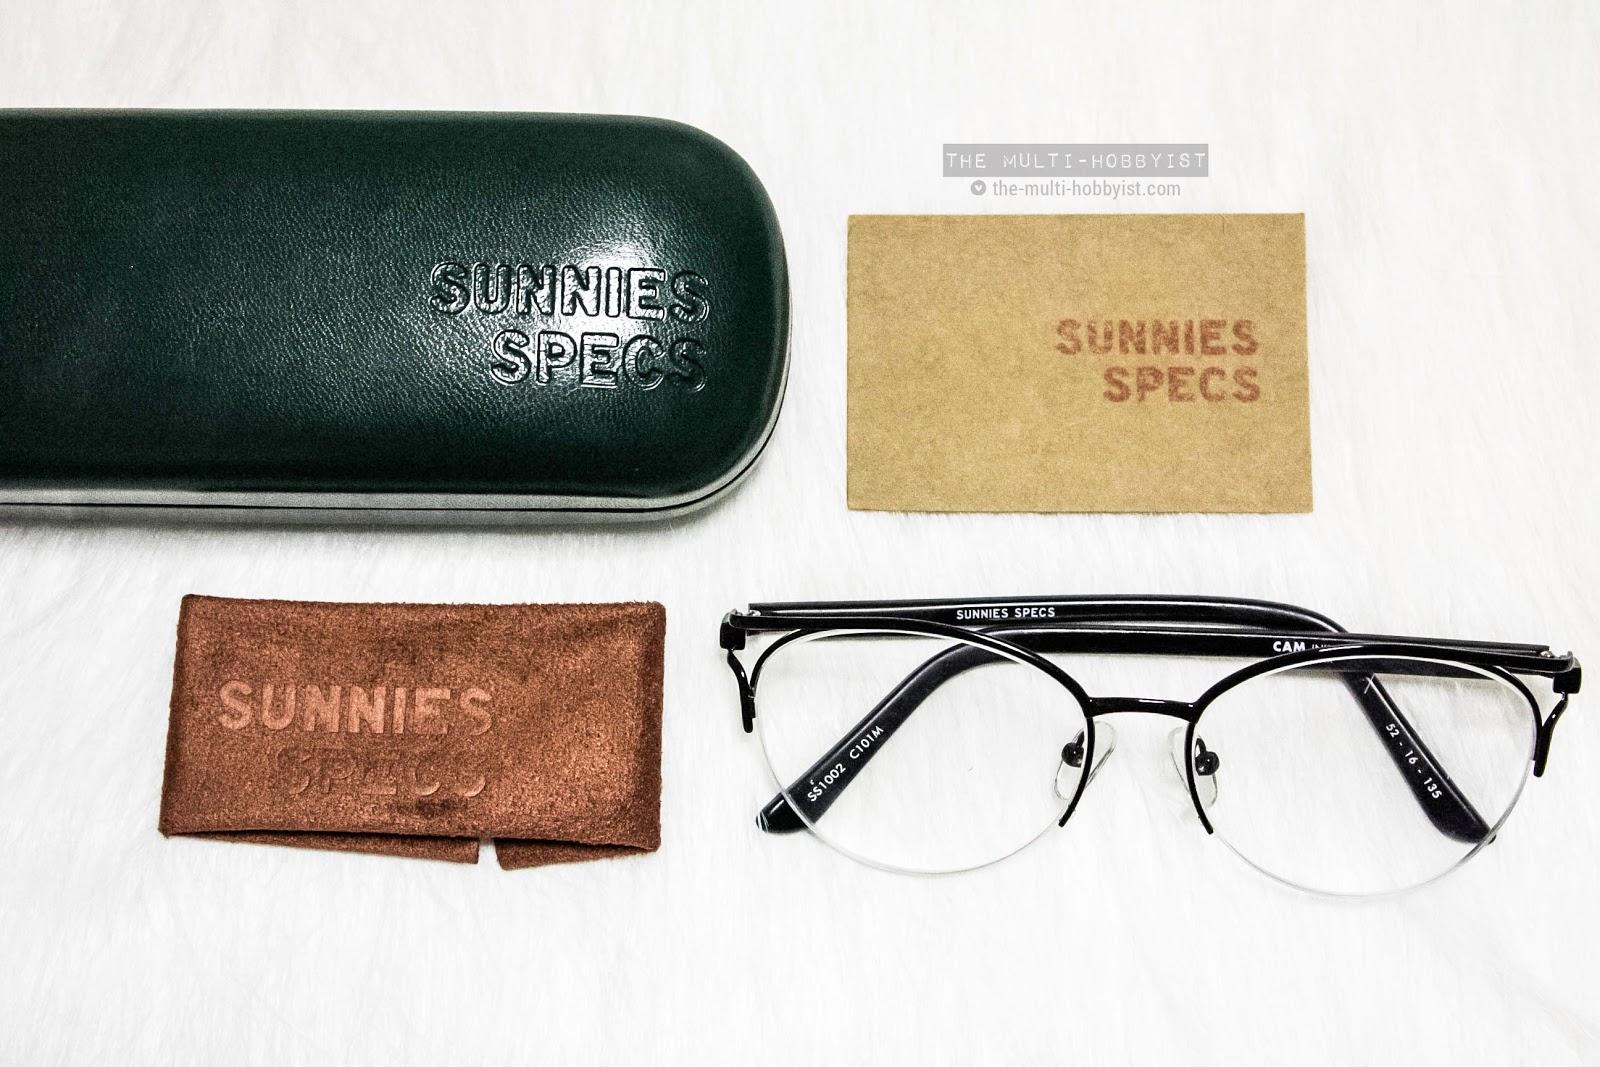 My Sunnies Specs kit | Sunnies Specs Review